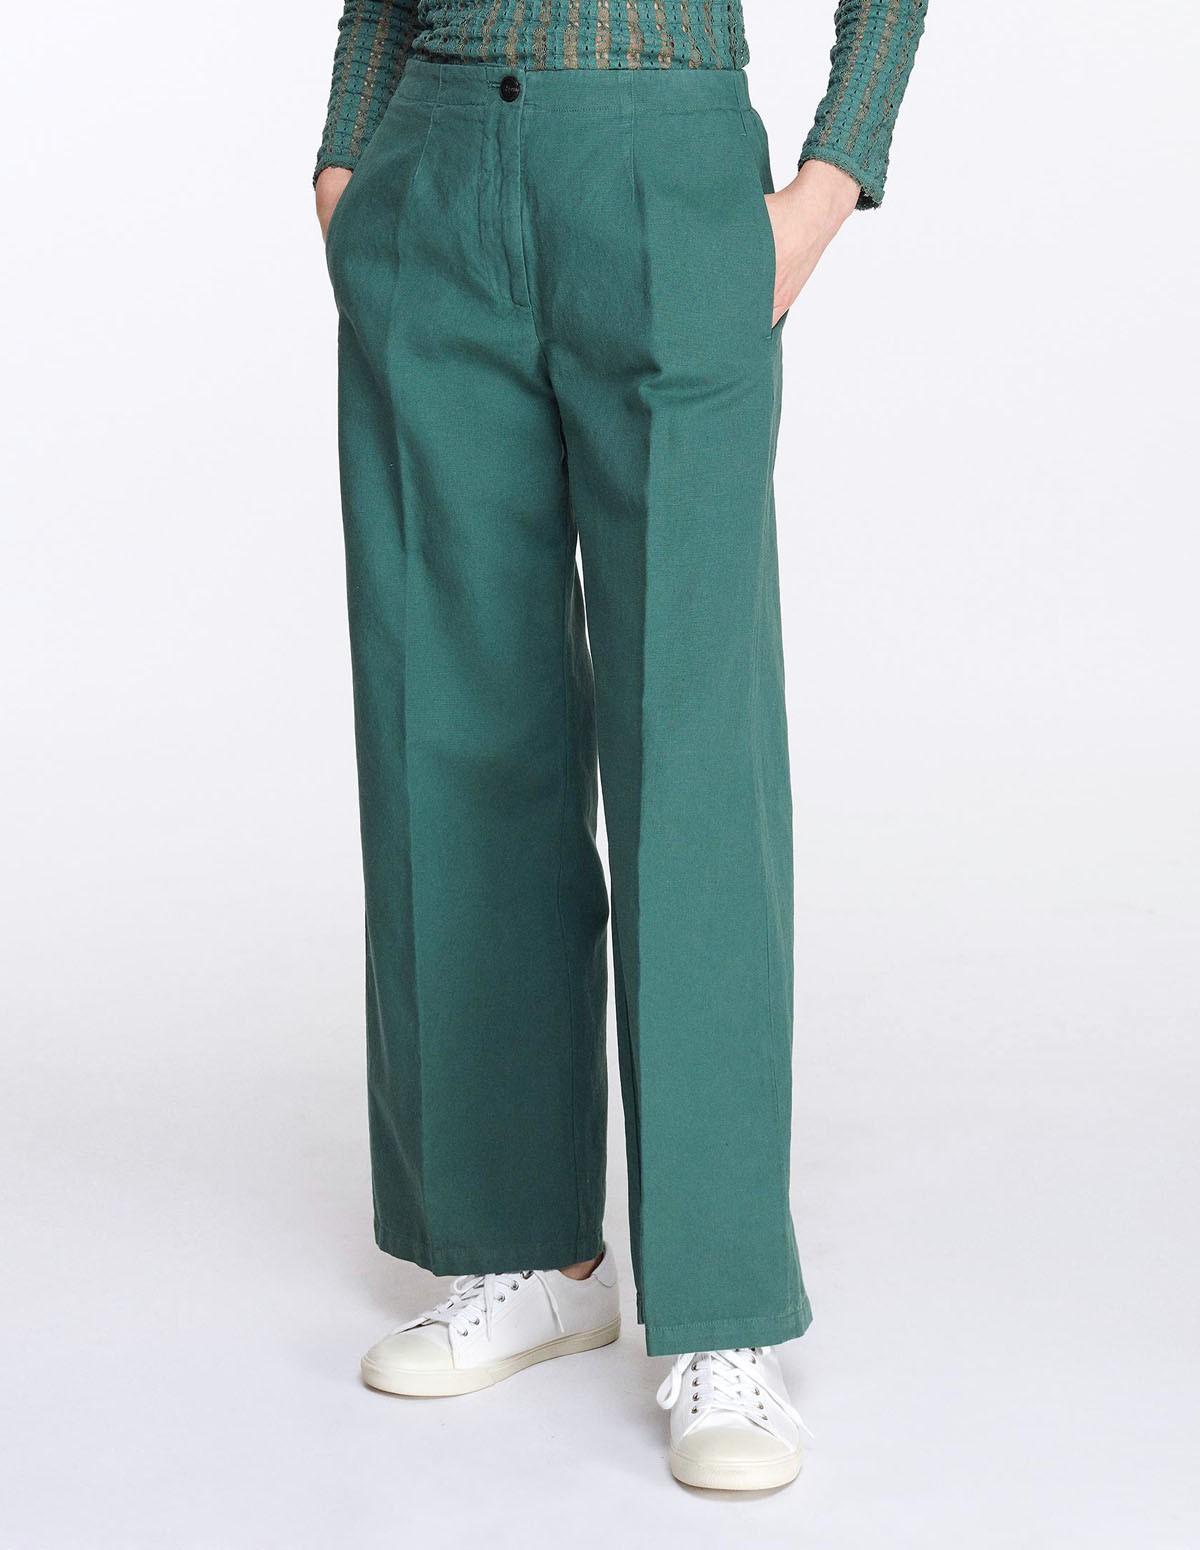 Pom 7128/10547 Pants - LICHEN GREEN 77